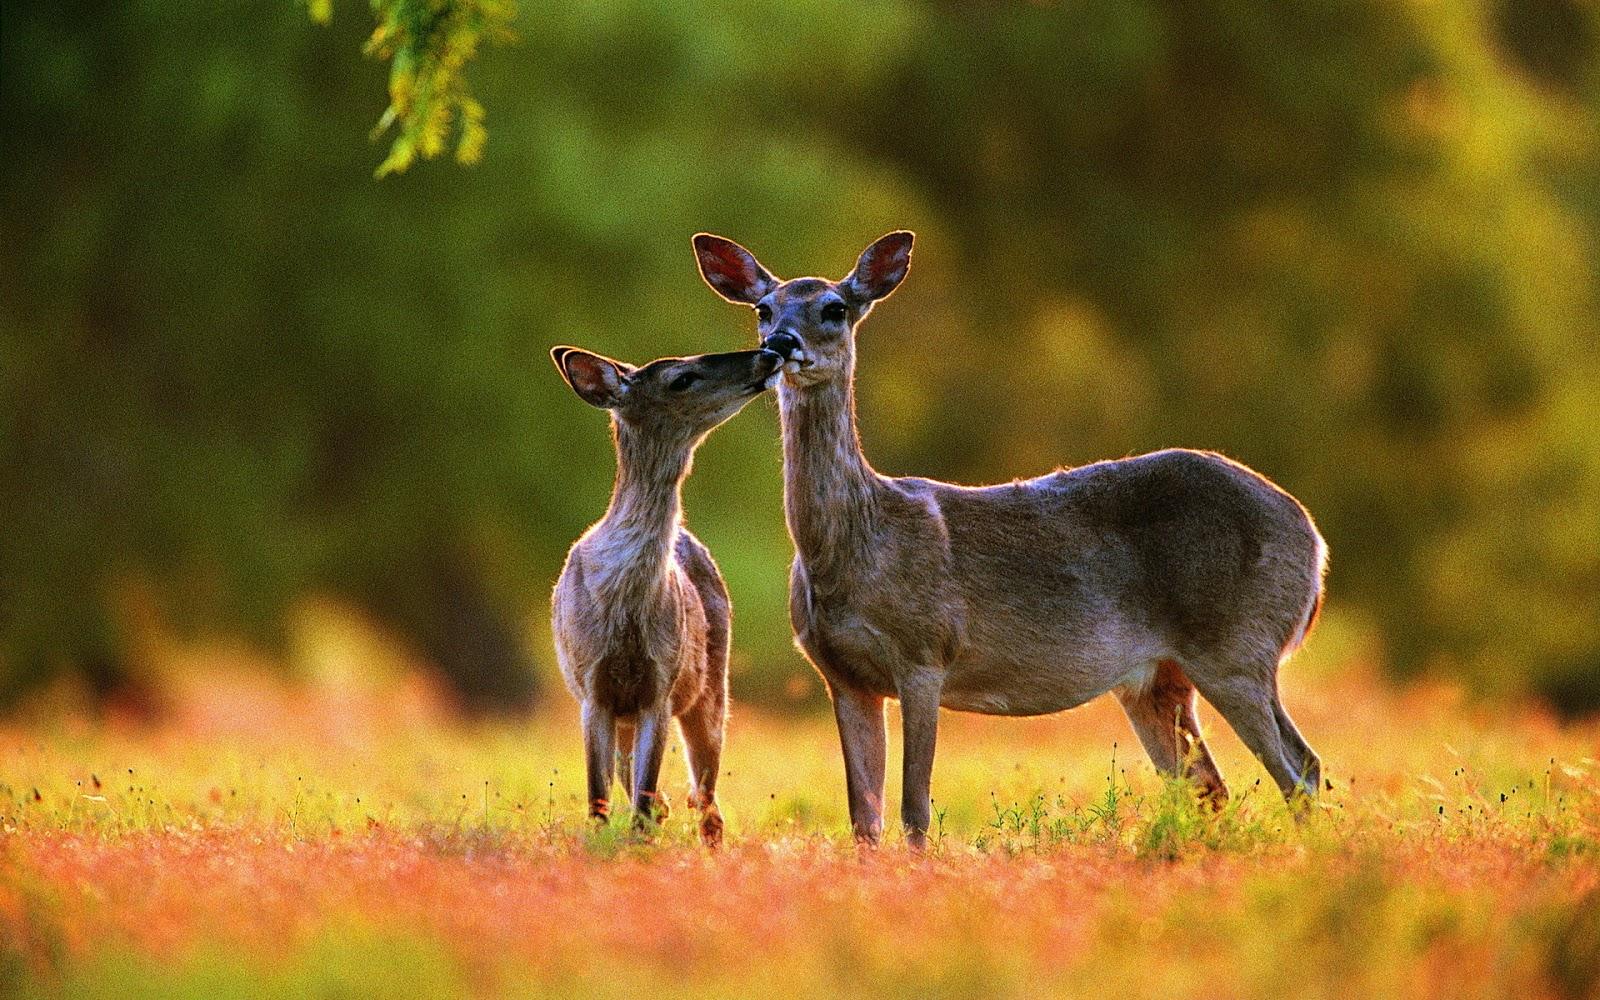 letest and best animals hd wallpapers download animals desktop